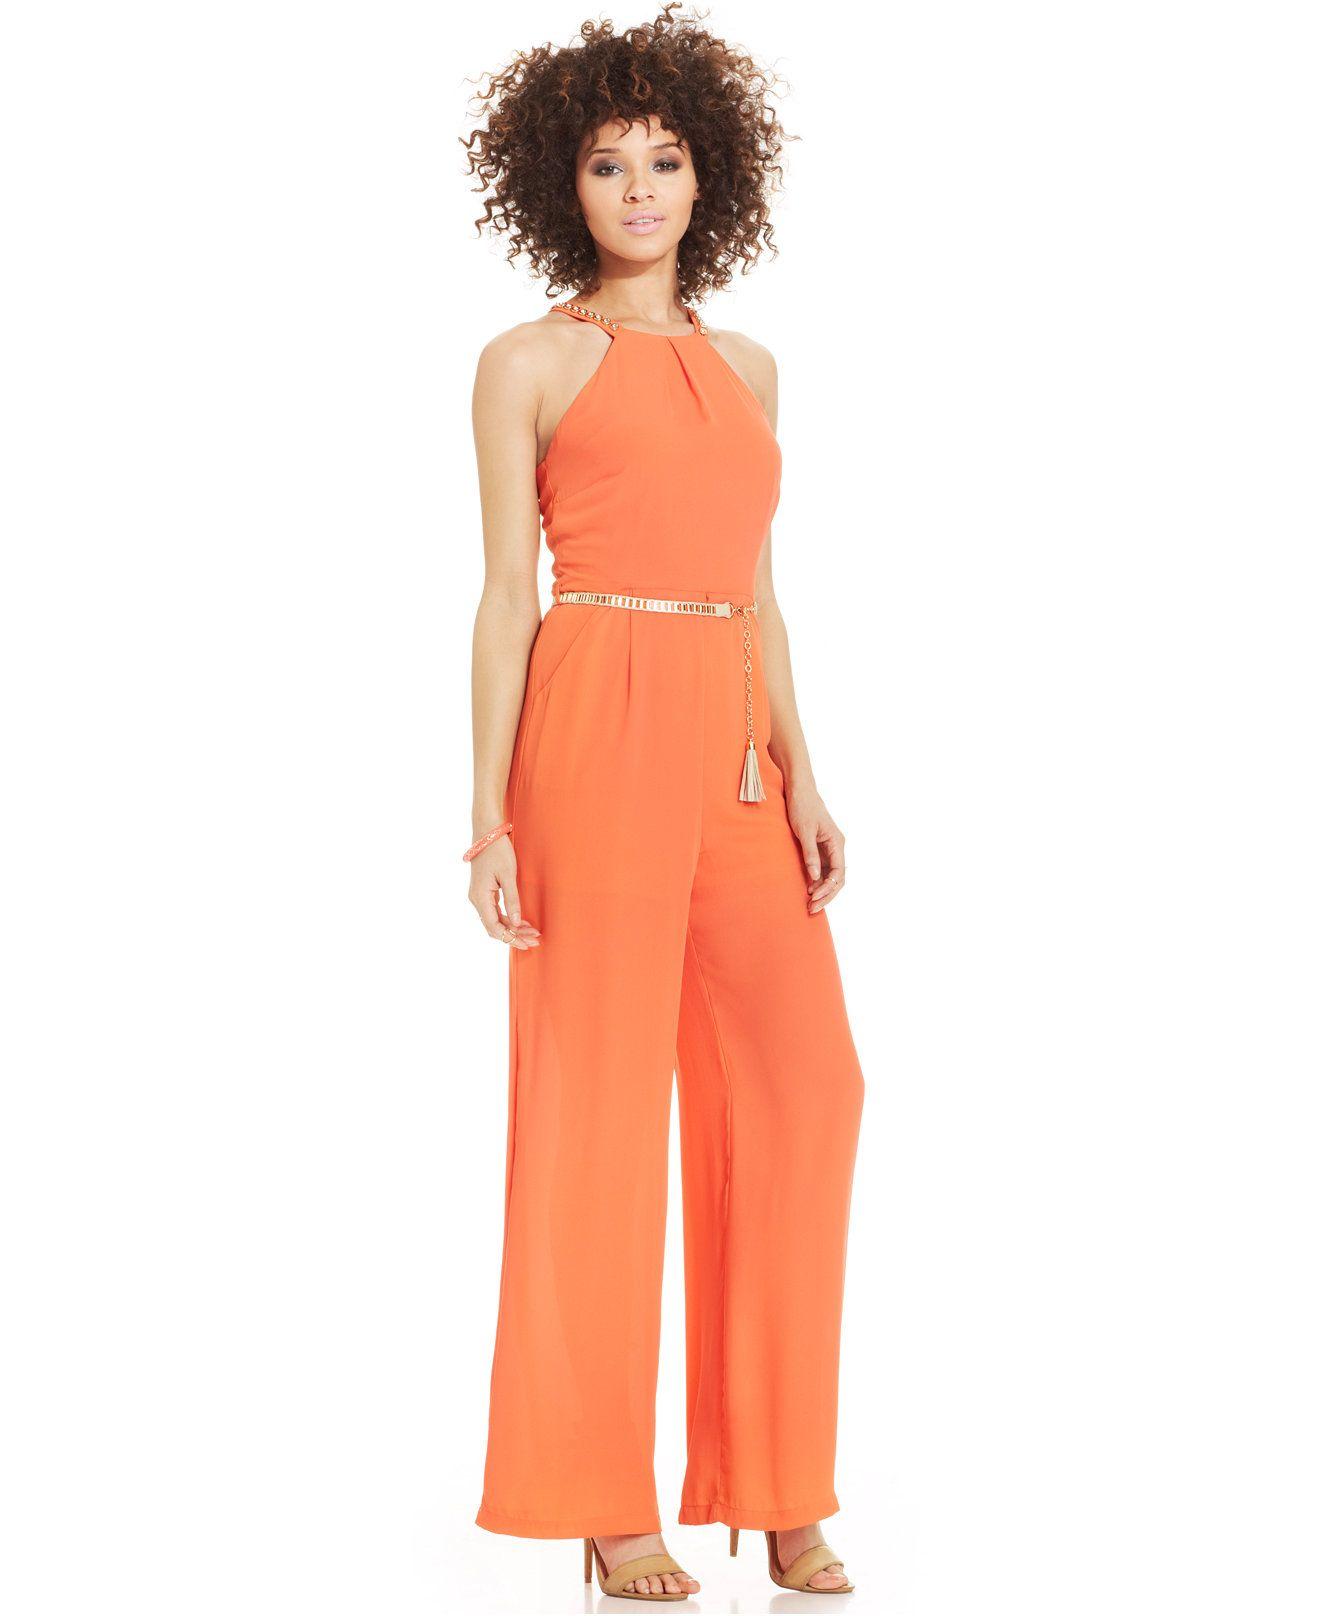 ad96cd2a8da57 XOXO Wide-Leg Belted Jumpsuit - Juniors XOXO - Macy's #fashion ...